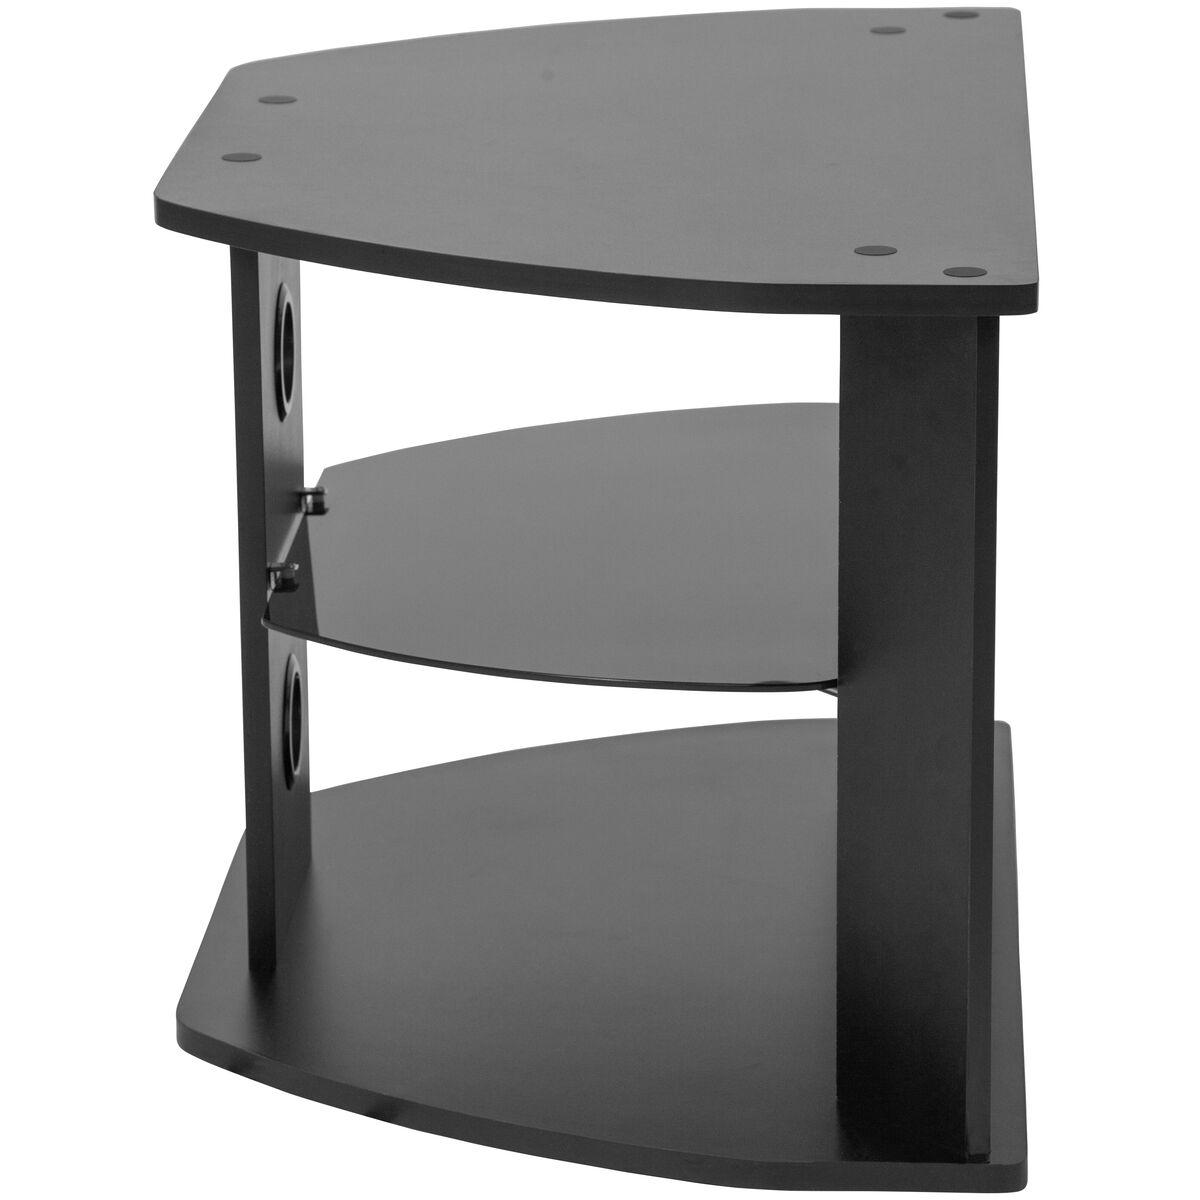 Black Tv Stand With Shelves Nan Rydal Gg Bizchair Com